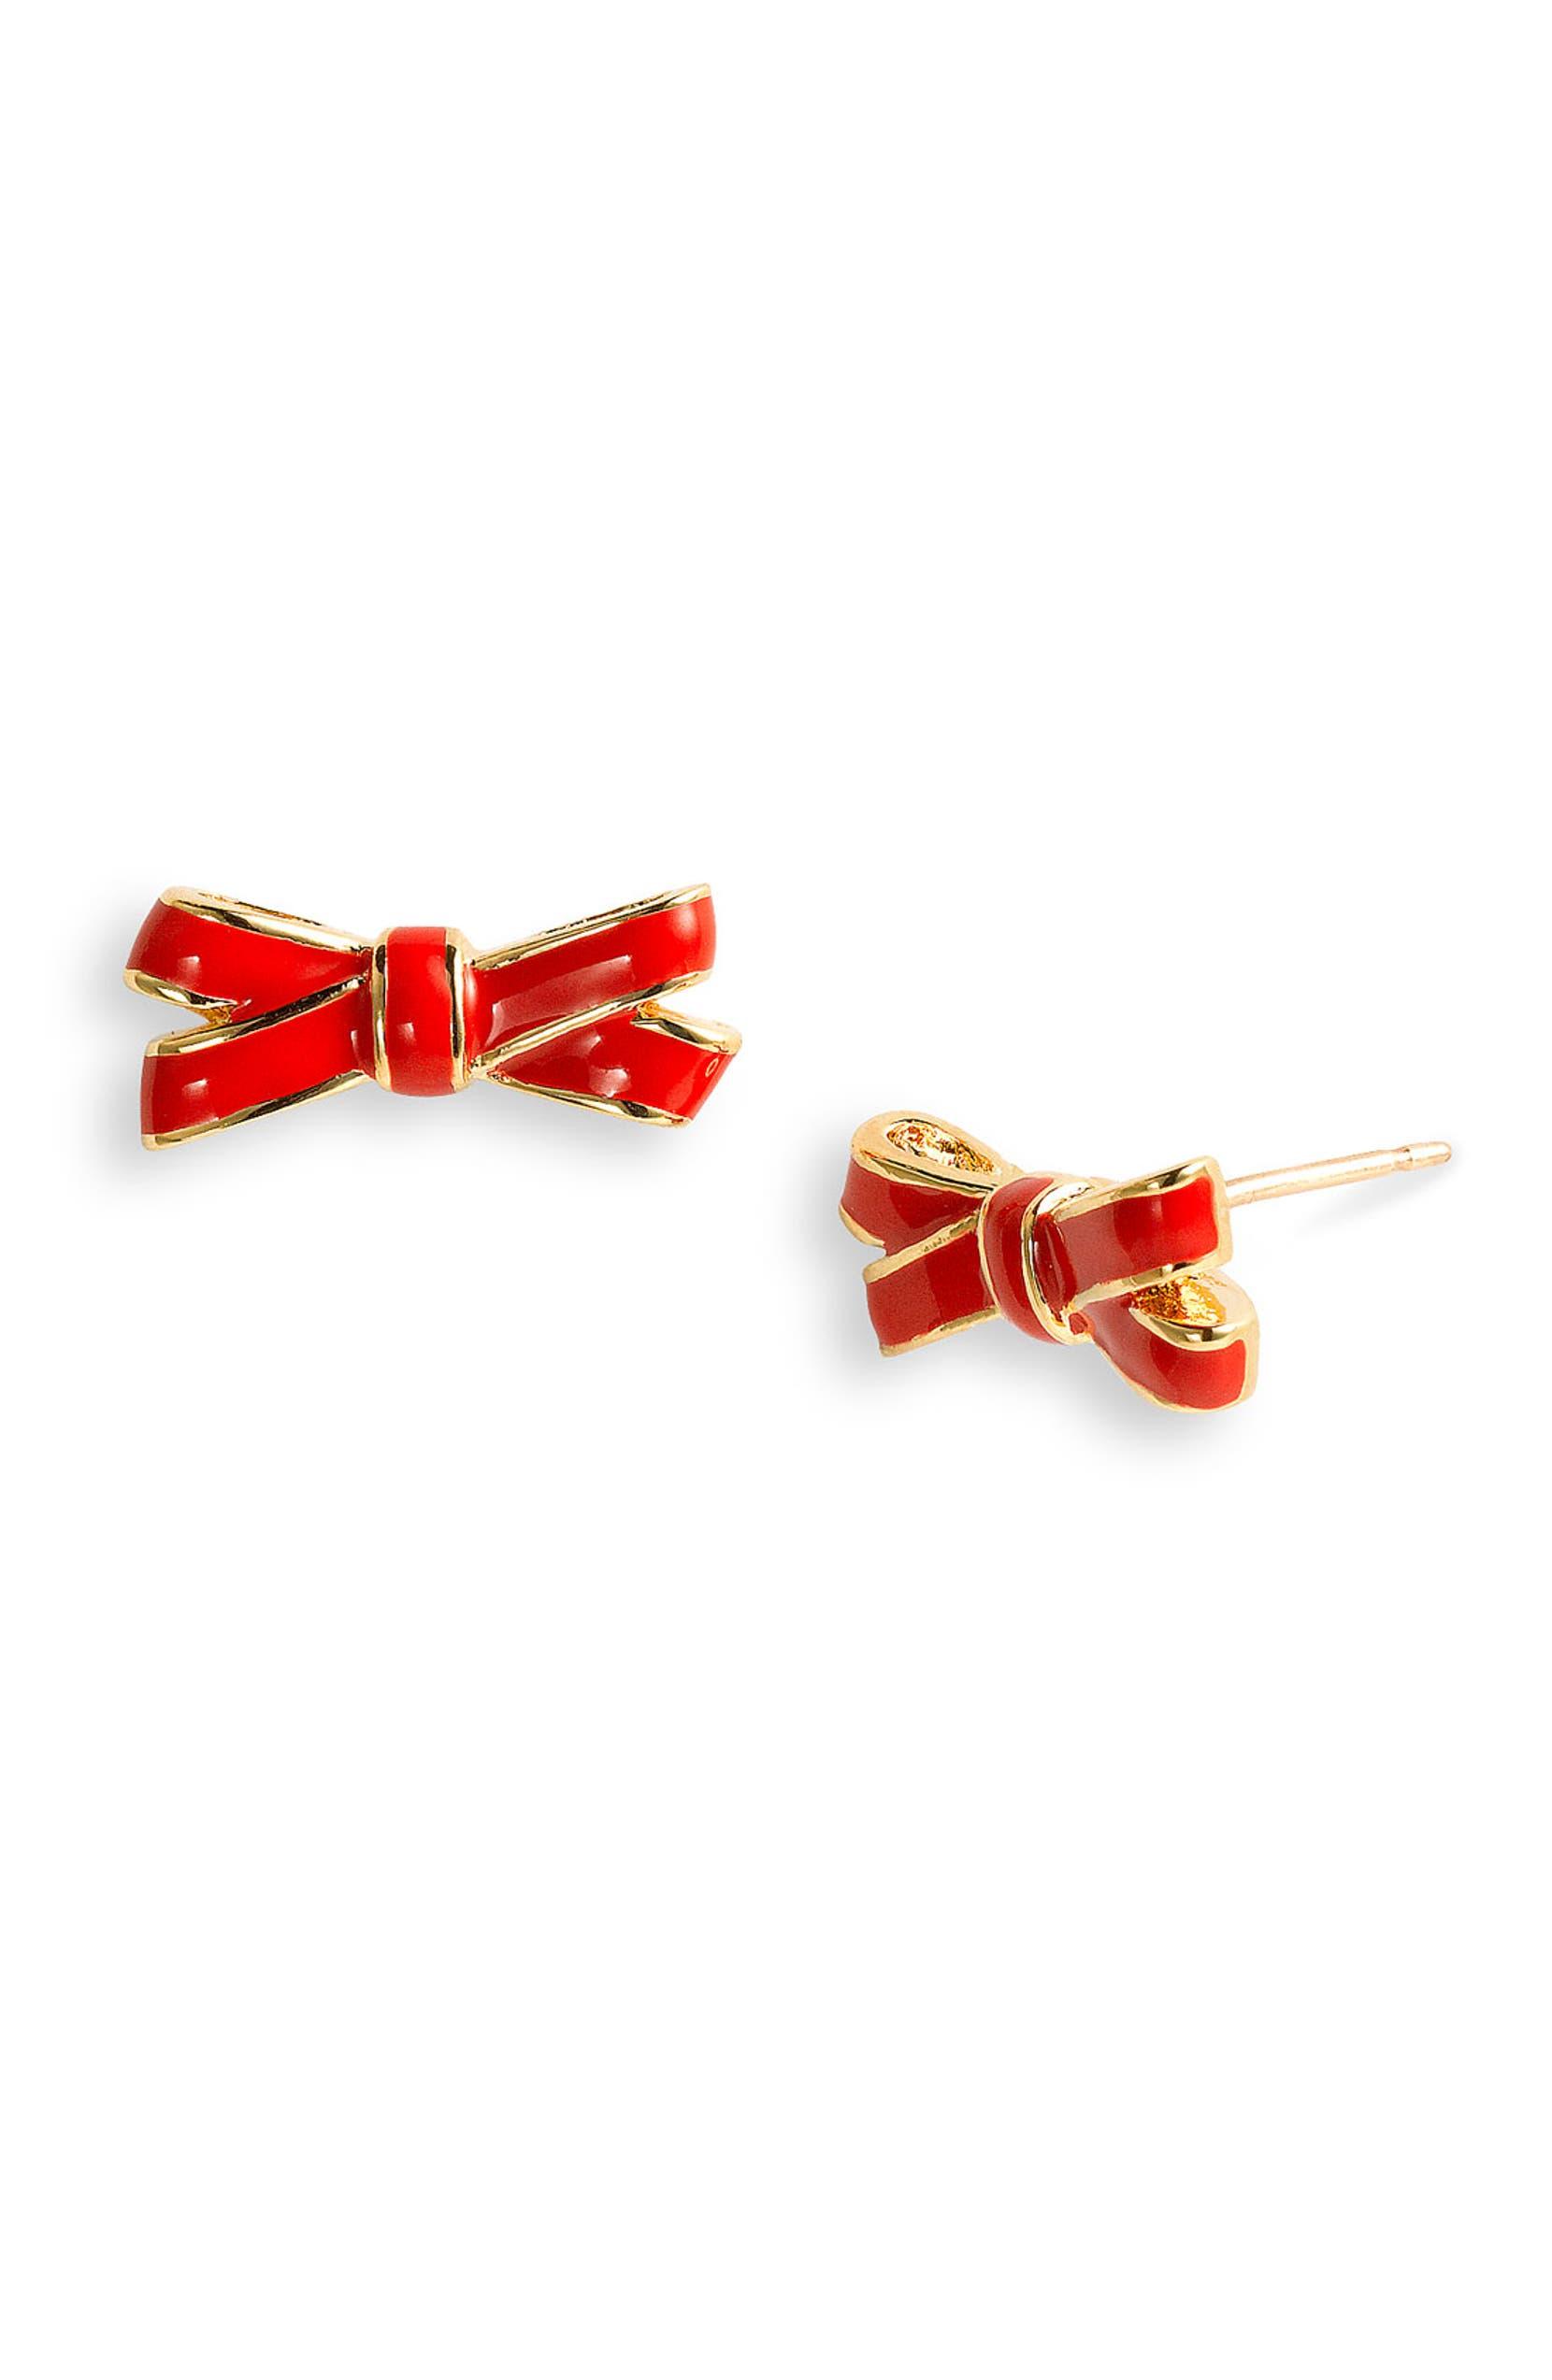 kate spade new york double bow stud earrings   Nordstrom